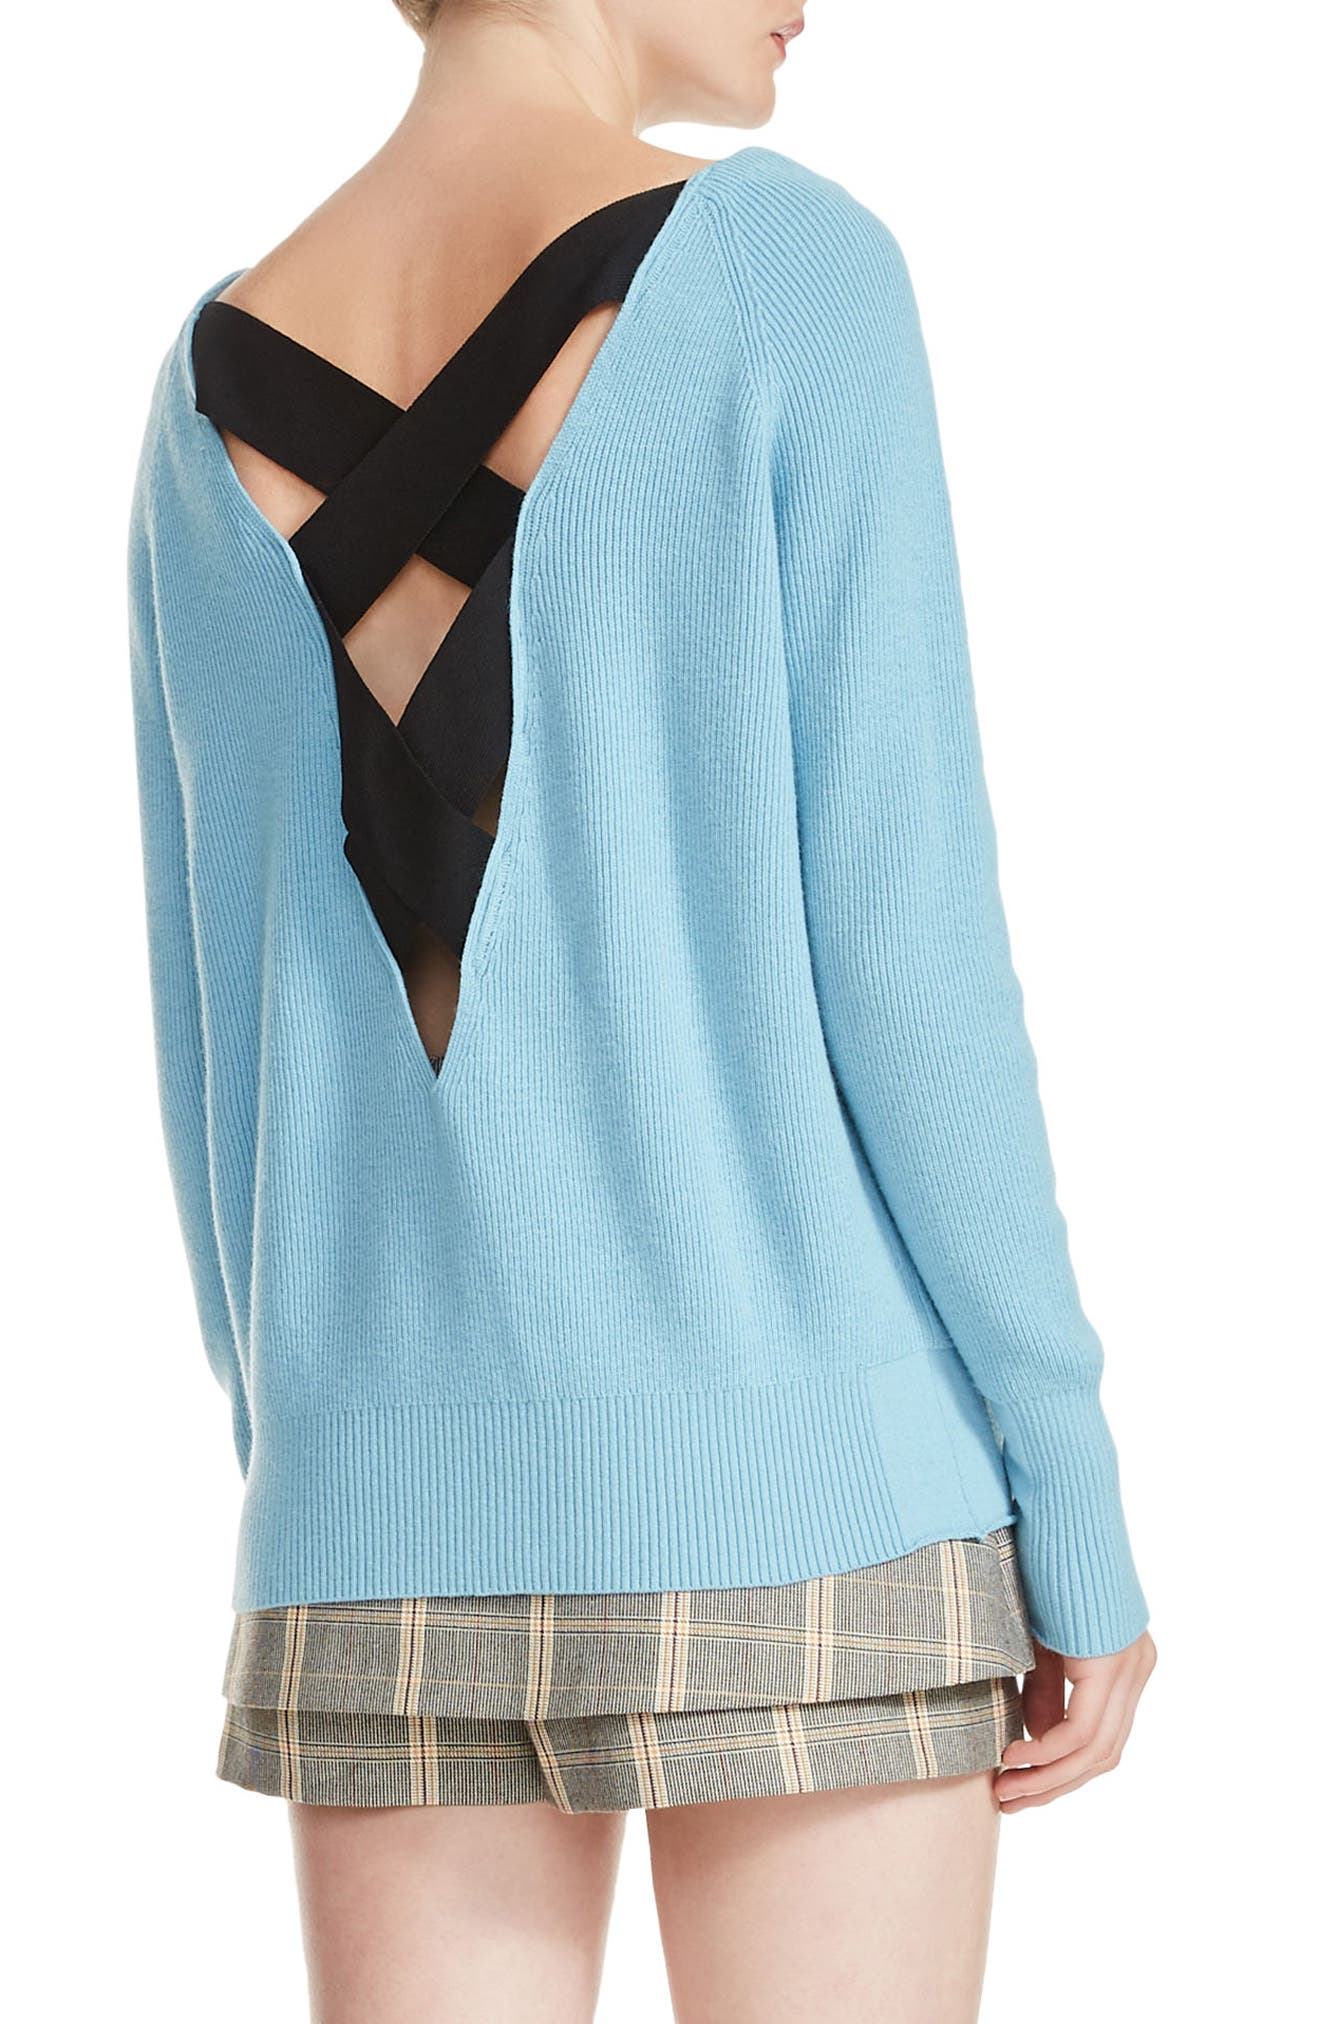 Moon Crisscross Back Rib Knit Sweater,                             Alternate thumbnail 2, color,                             400